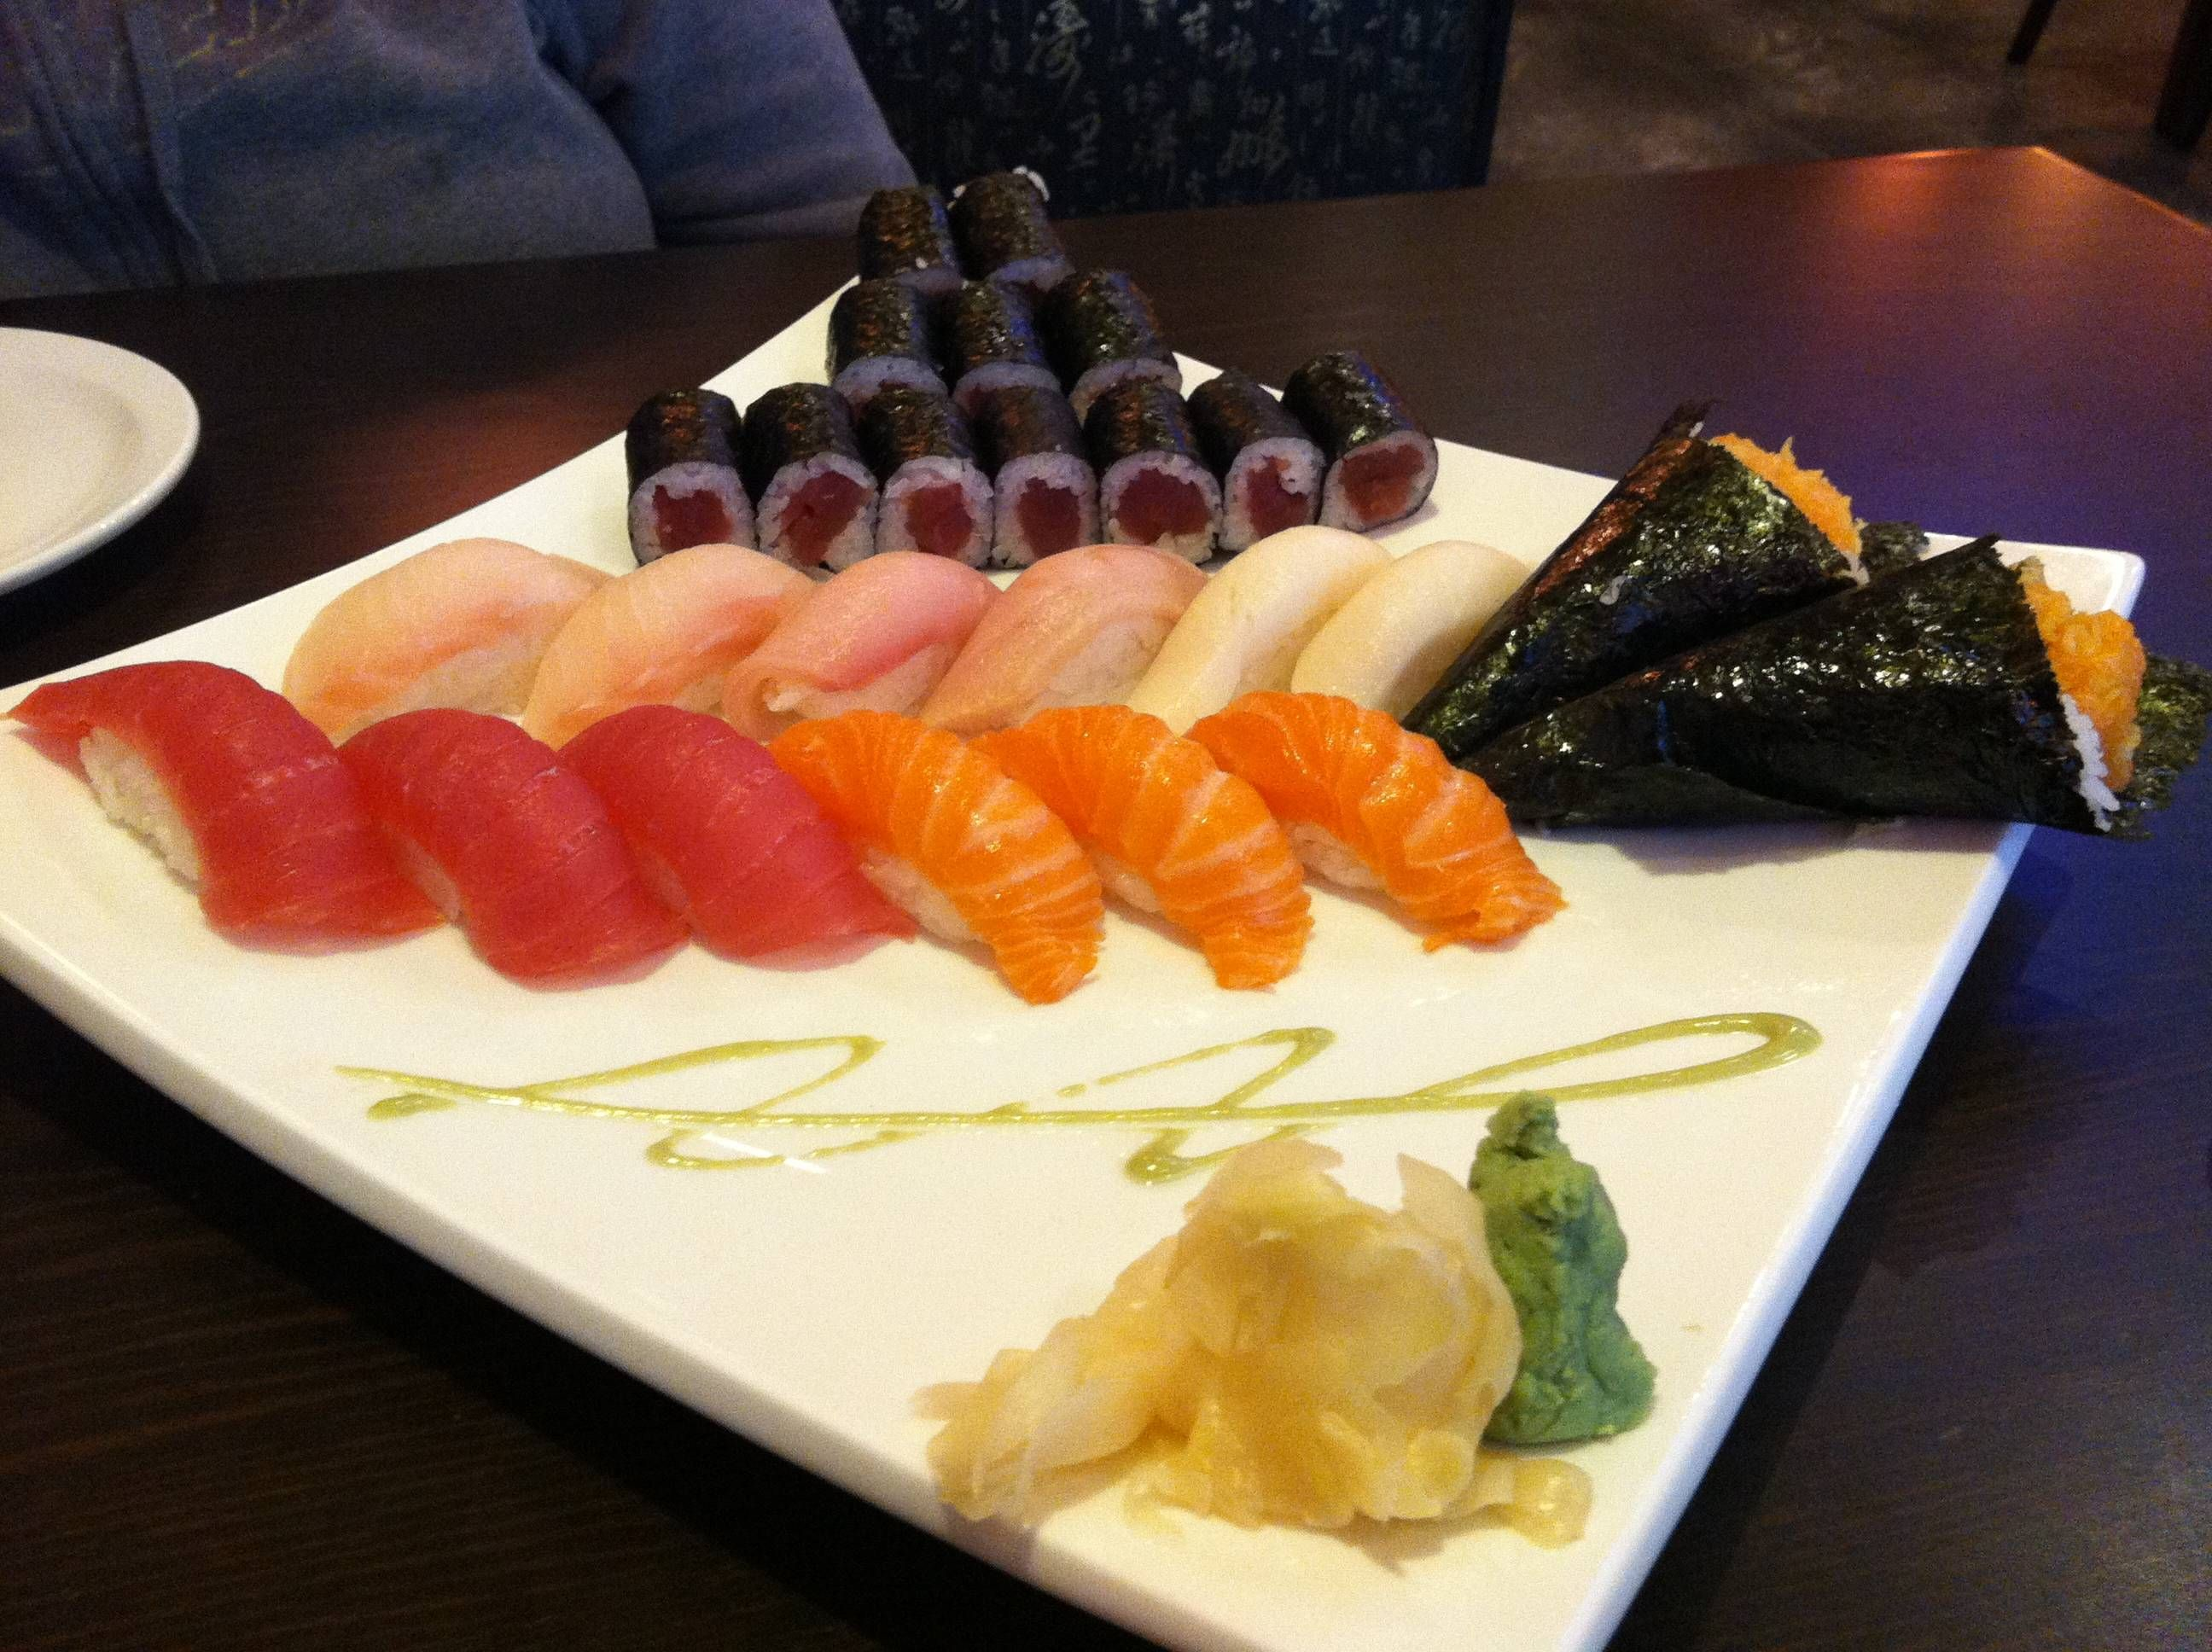 Fuji Sushi in Midland, MI Sushi, Eating habits, Food